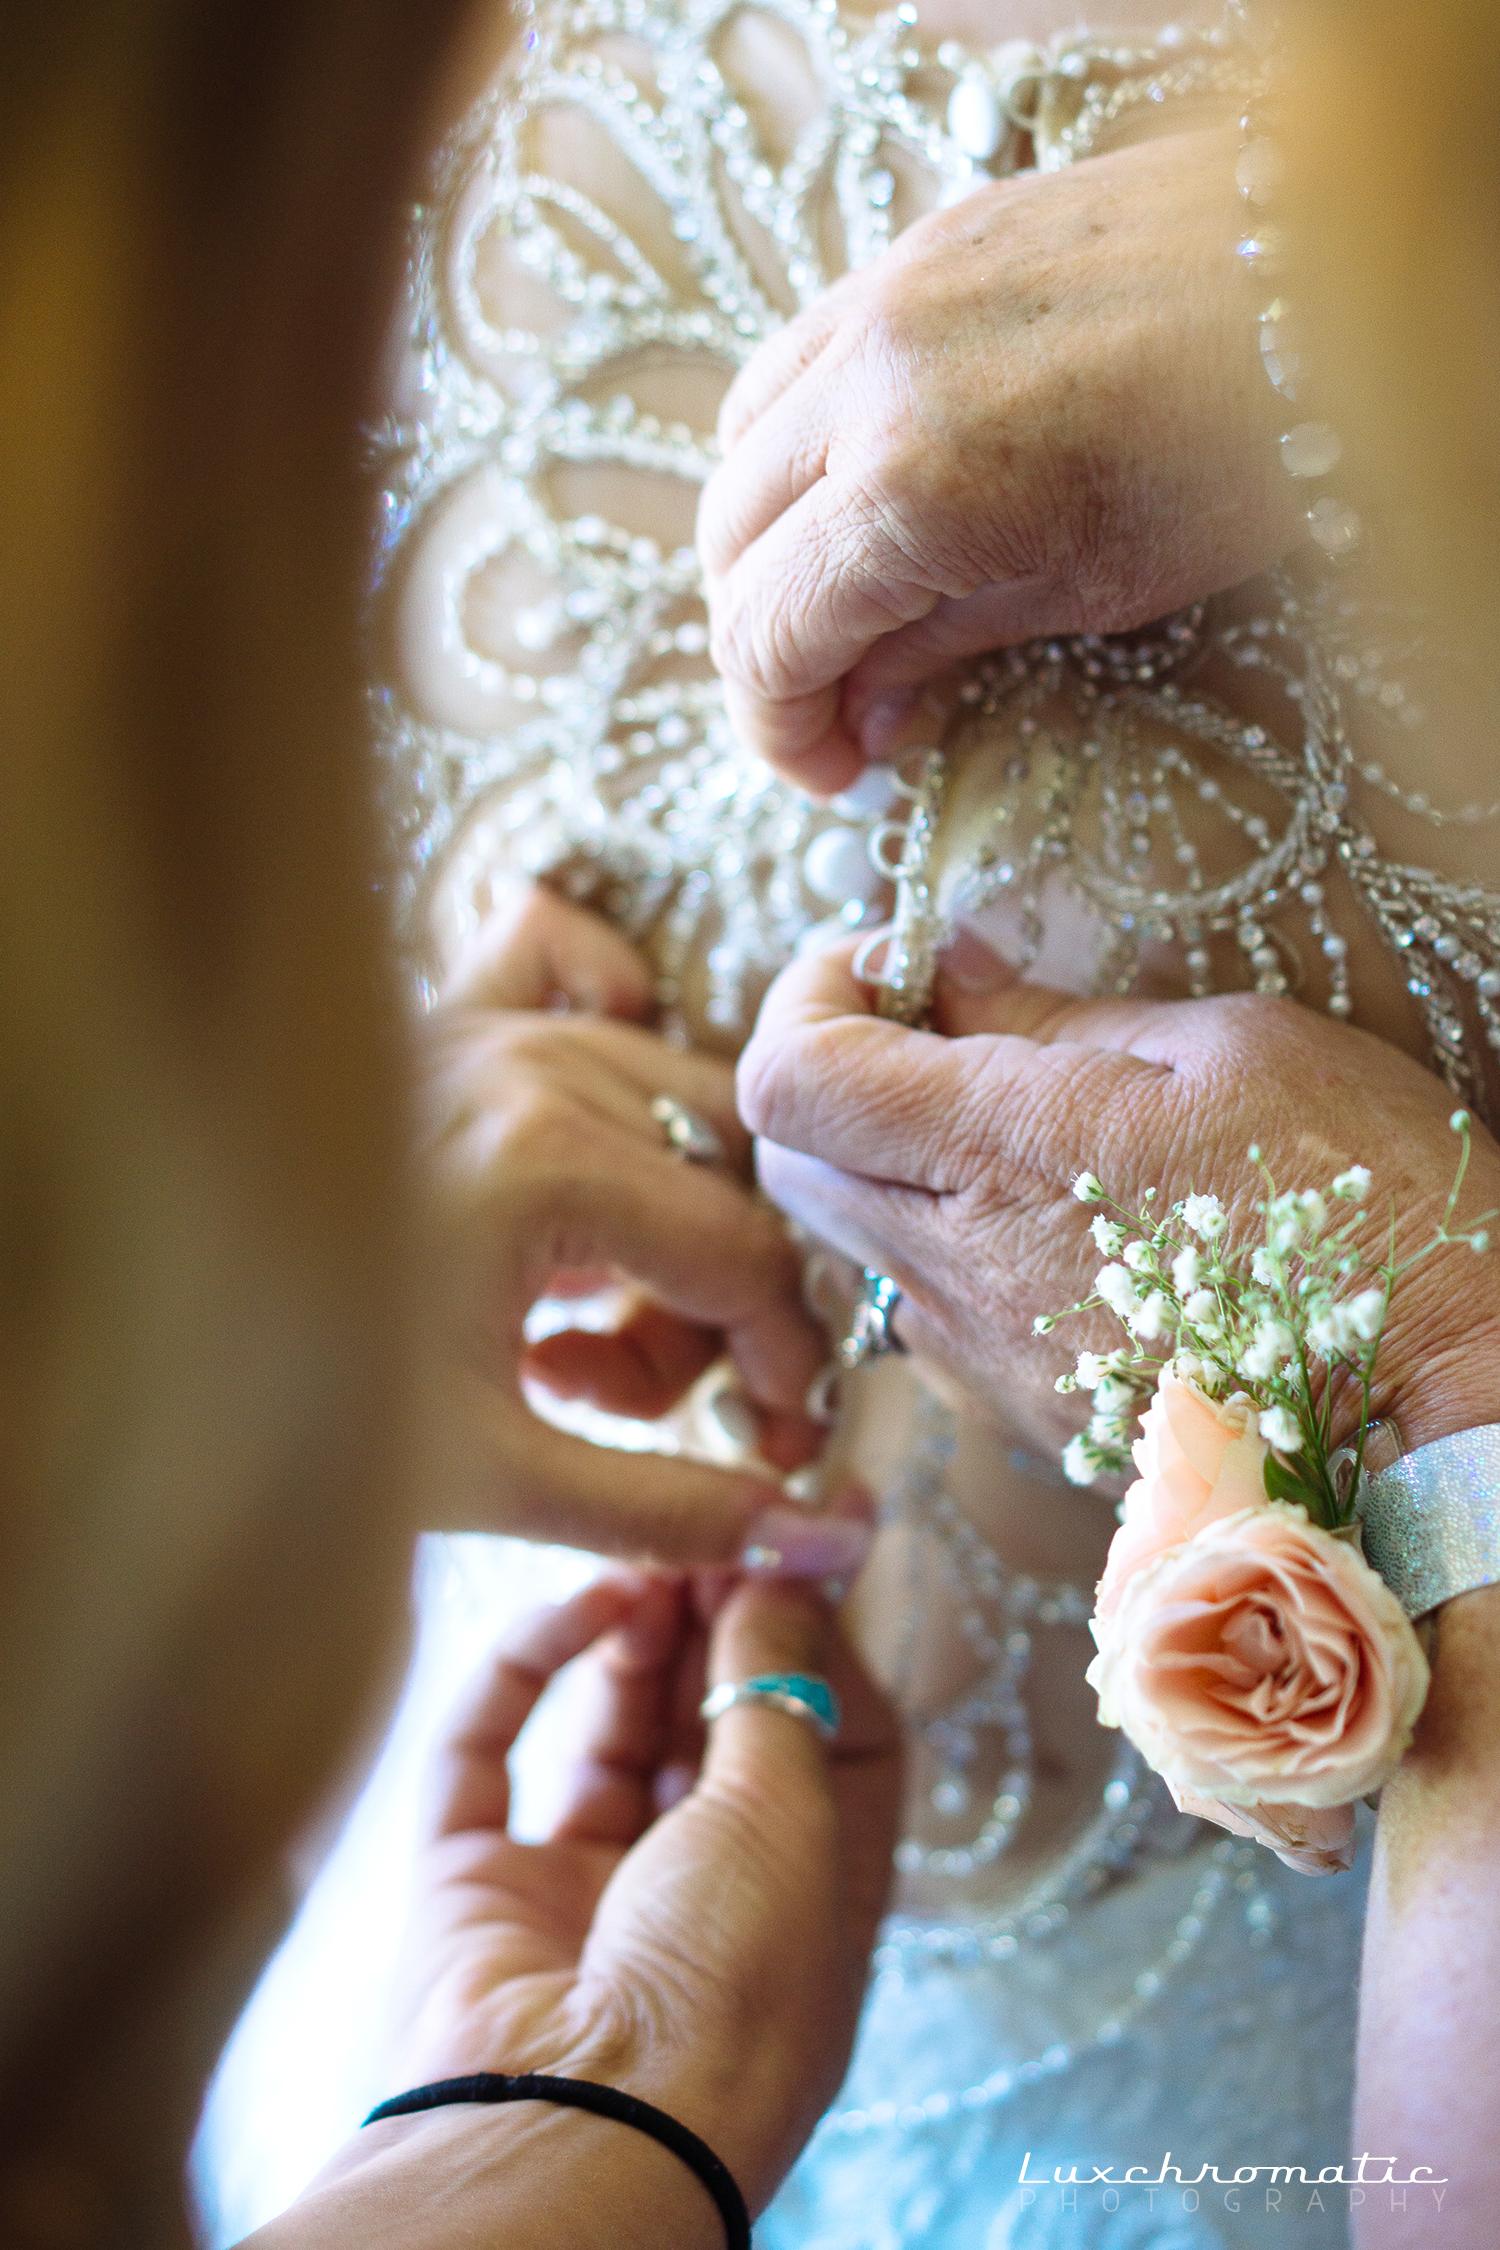 052017_Natalie_Travis-1032-San-Francisco-Bay-Area-Fremont-East-Bay-Wedding-Church-Hotel-Silicon-Valley-Bride-Gown-Dress-Groom-Luxchromatic-Portrait-Sony-Alpha-a7Rii-Interfit-Profoto-Photographer-Photography.jpg